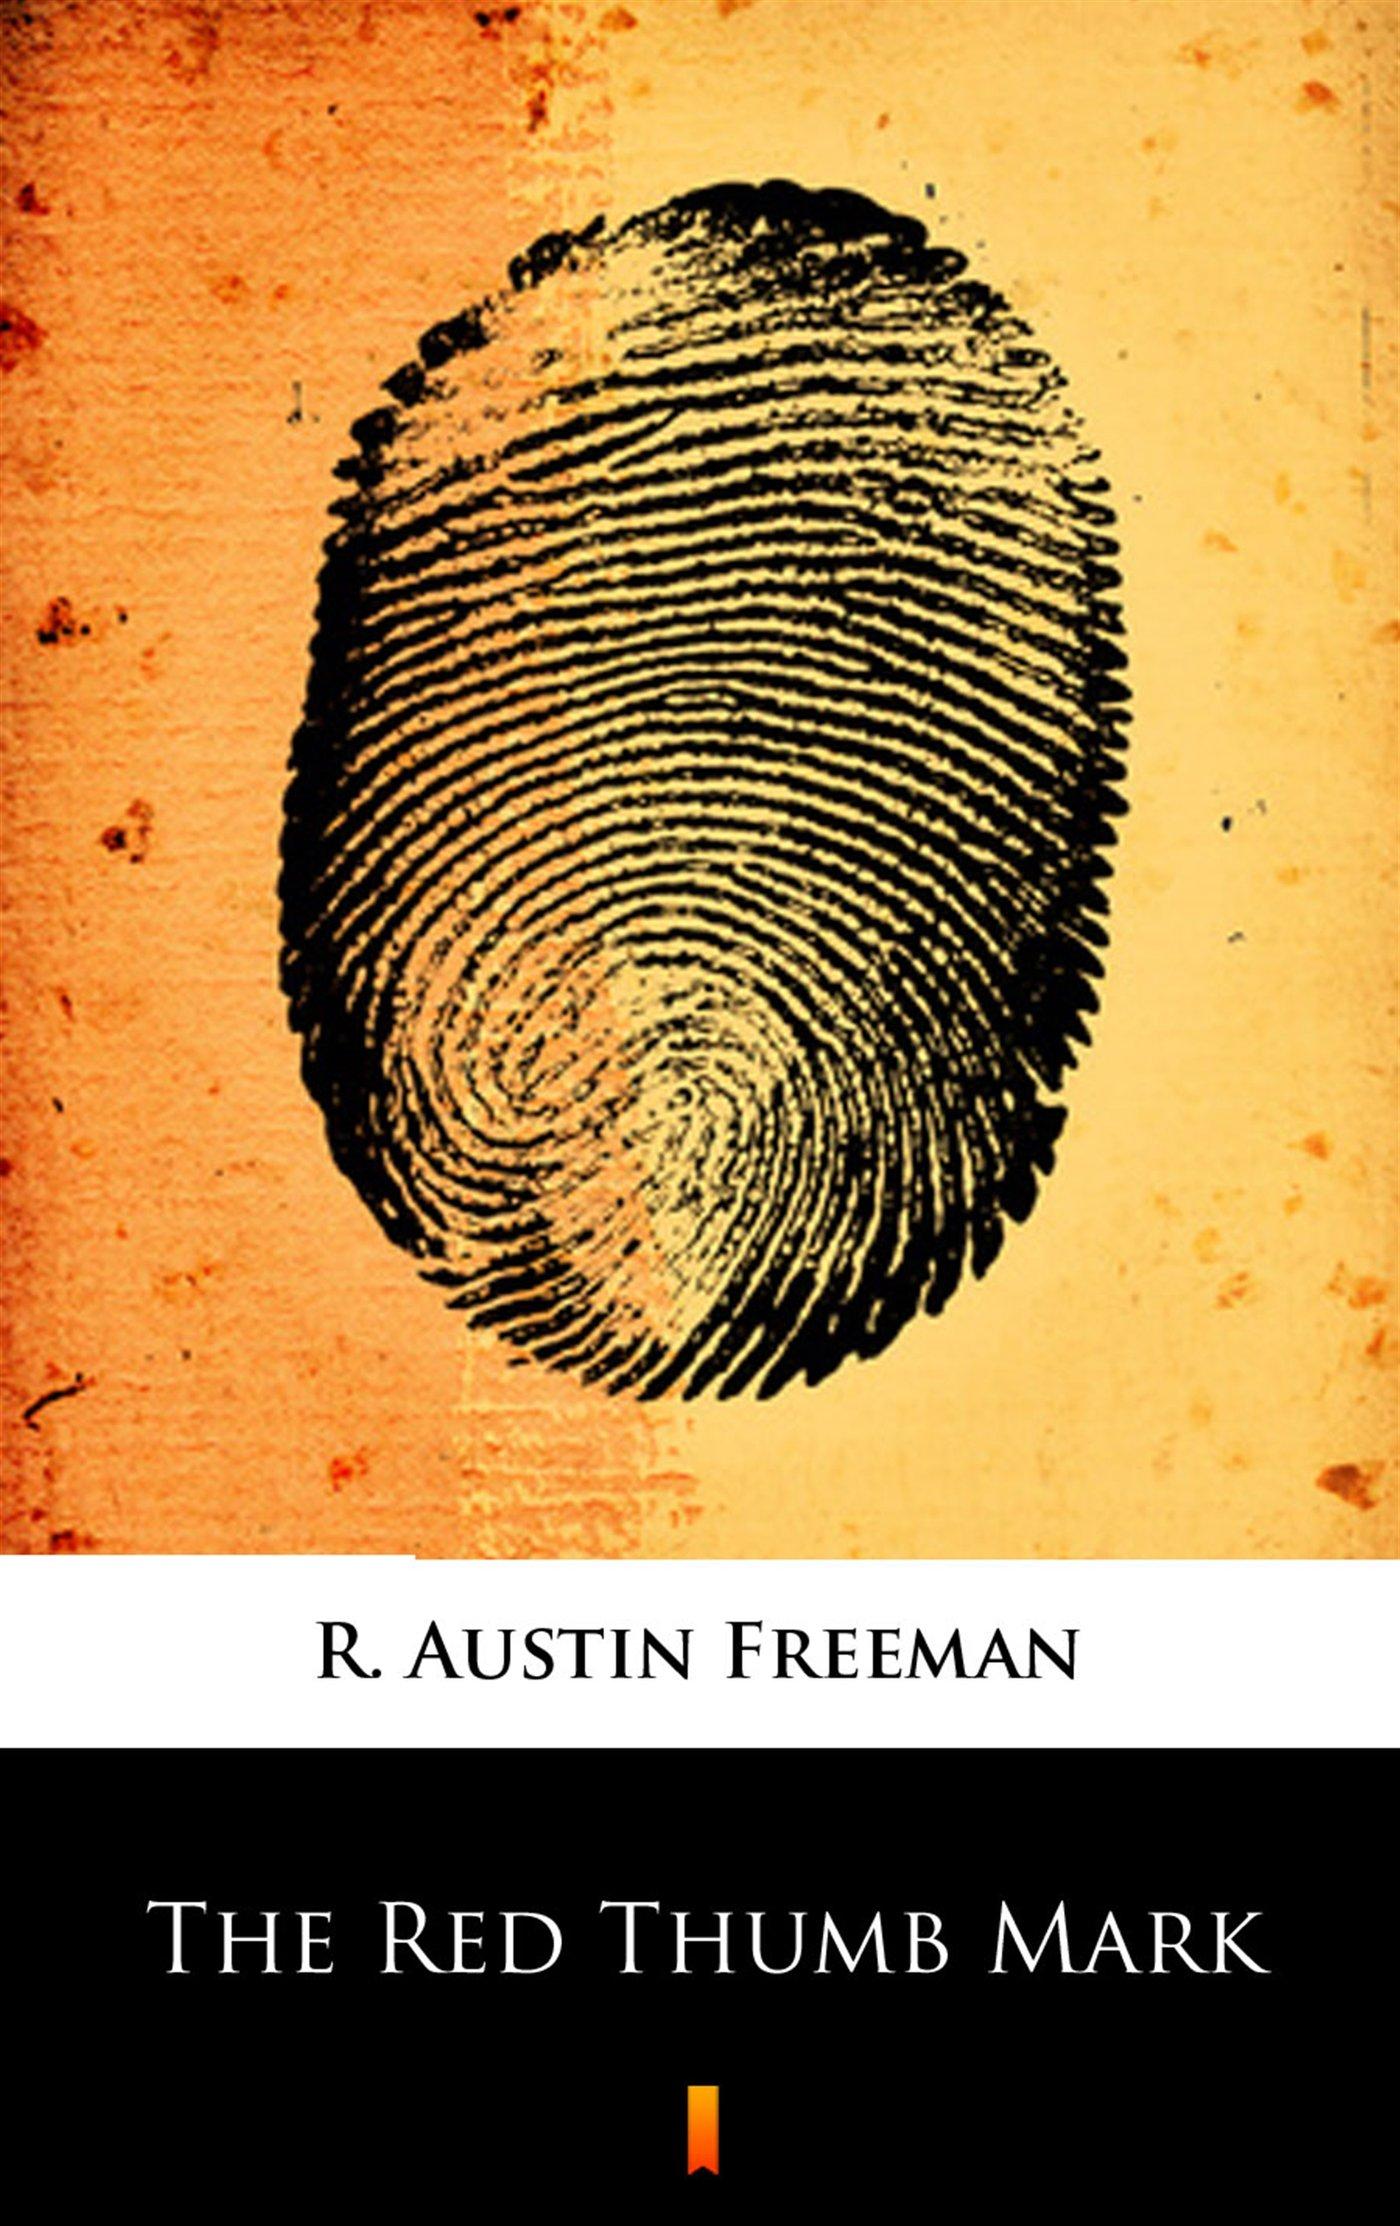 The Red Thumb Mark - Ebook (Książka EPUB) do pobrania w formacie EPUB